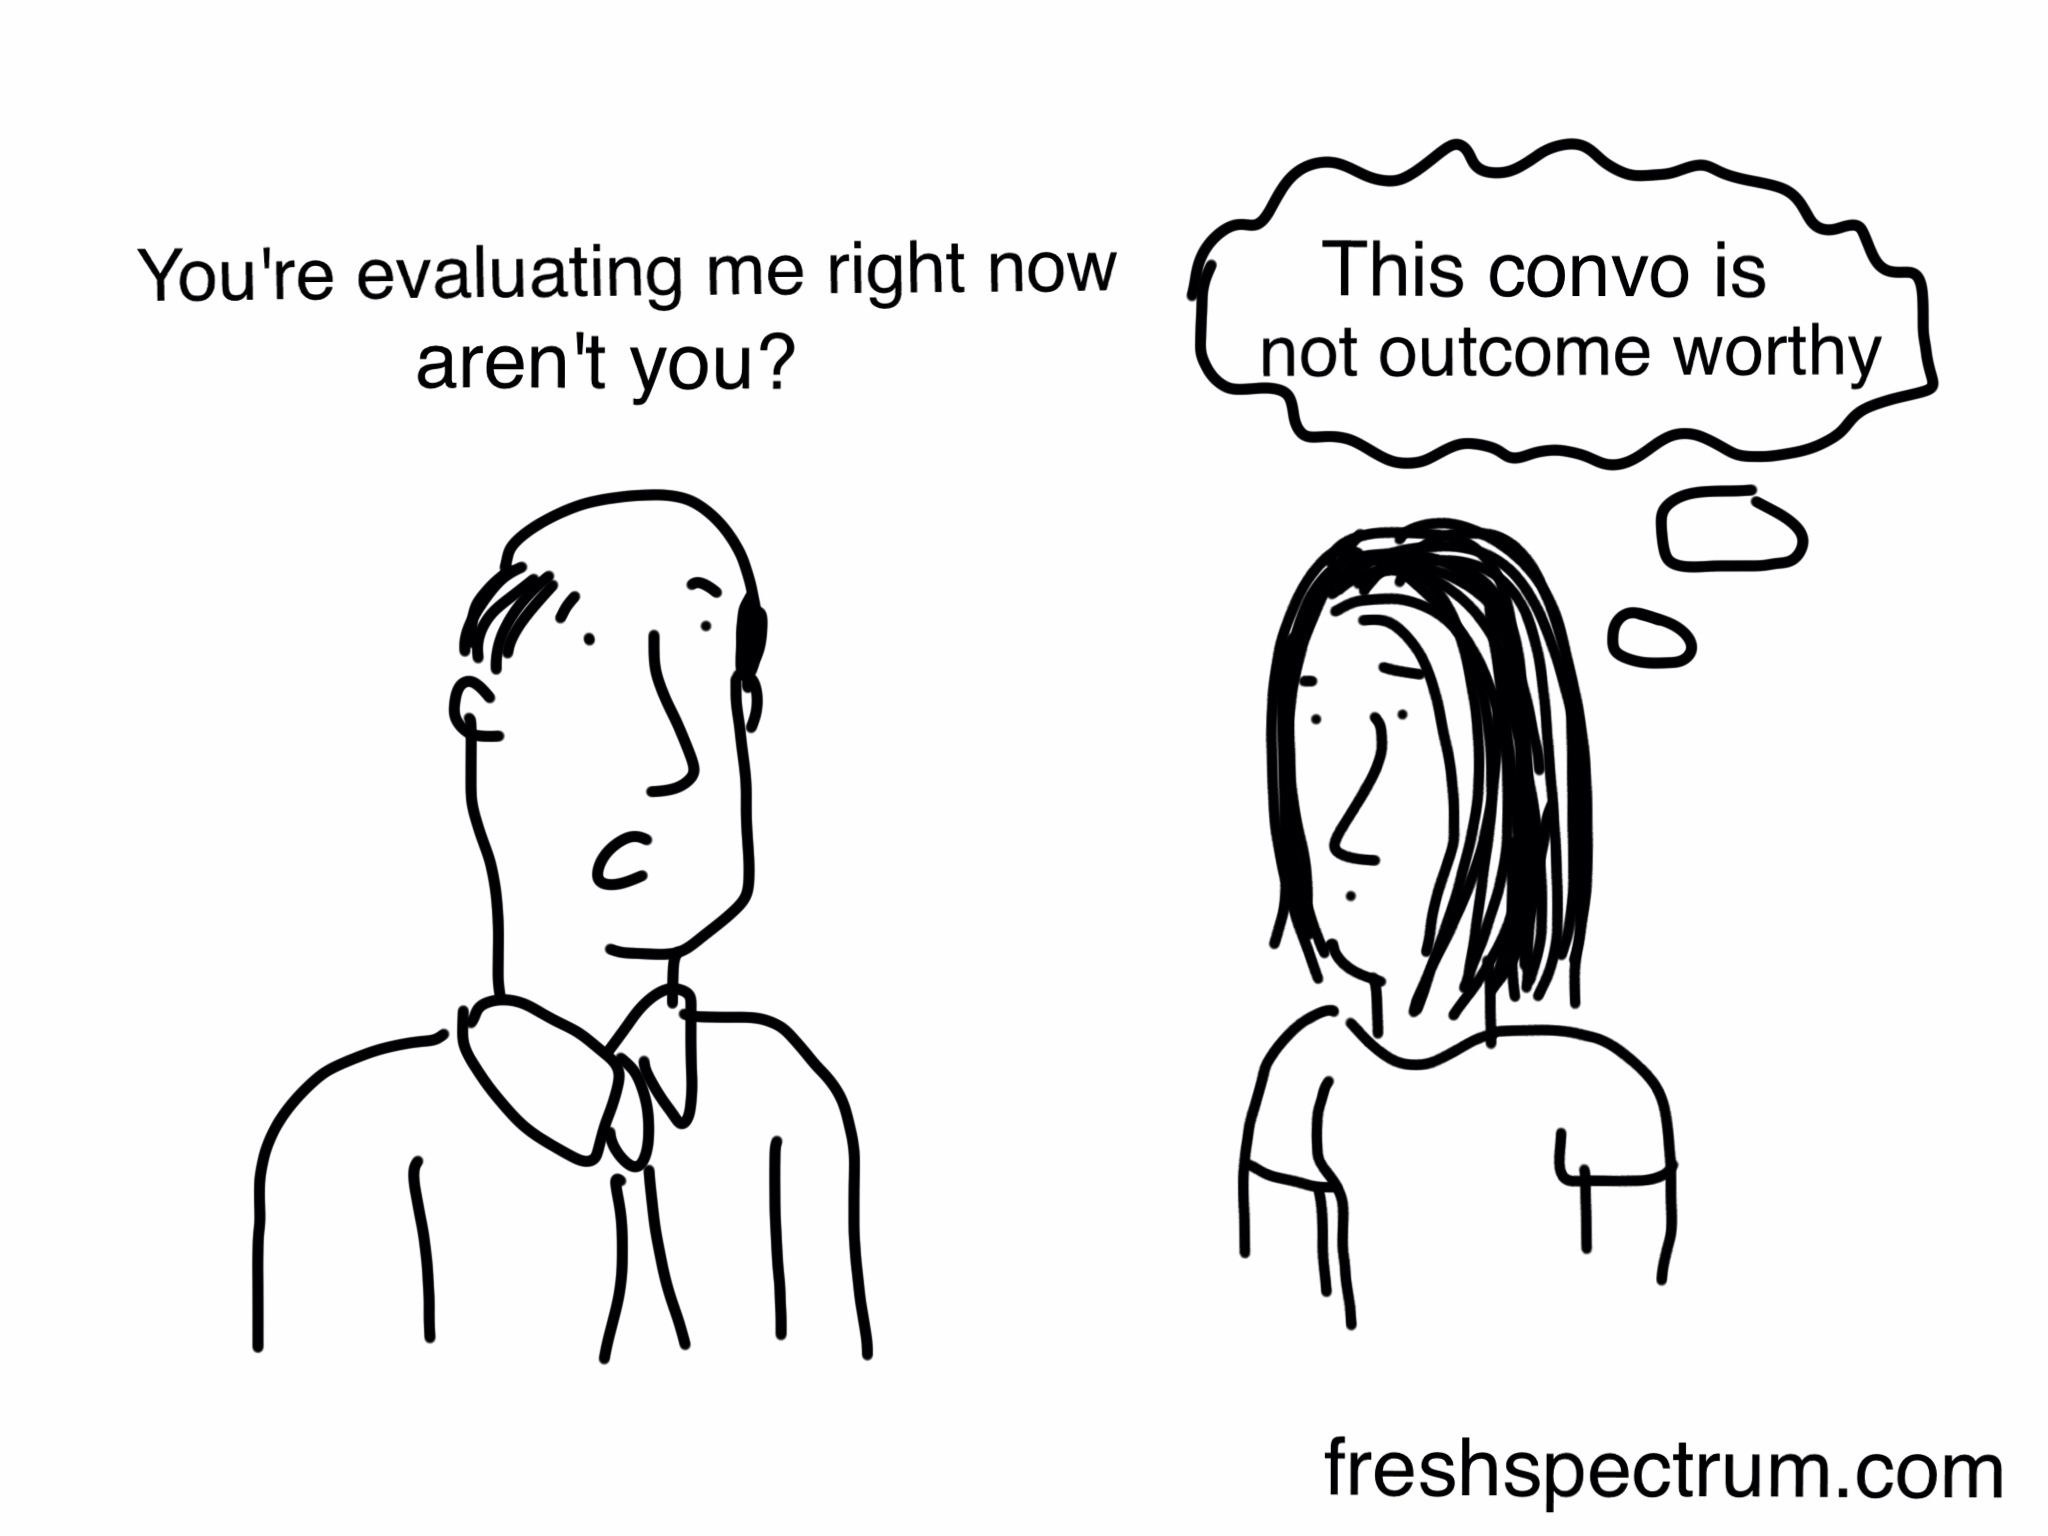 Anticipating Evaluation 2013 Evaluation Science Cartoons Data Science